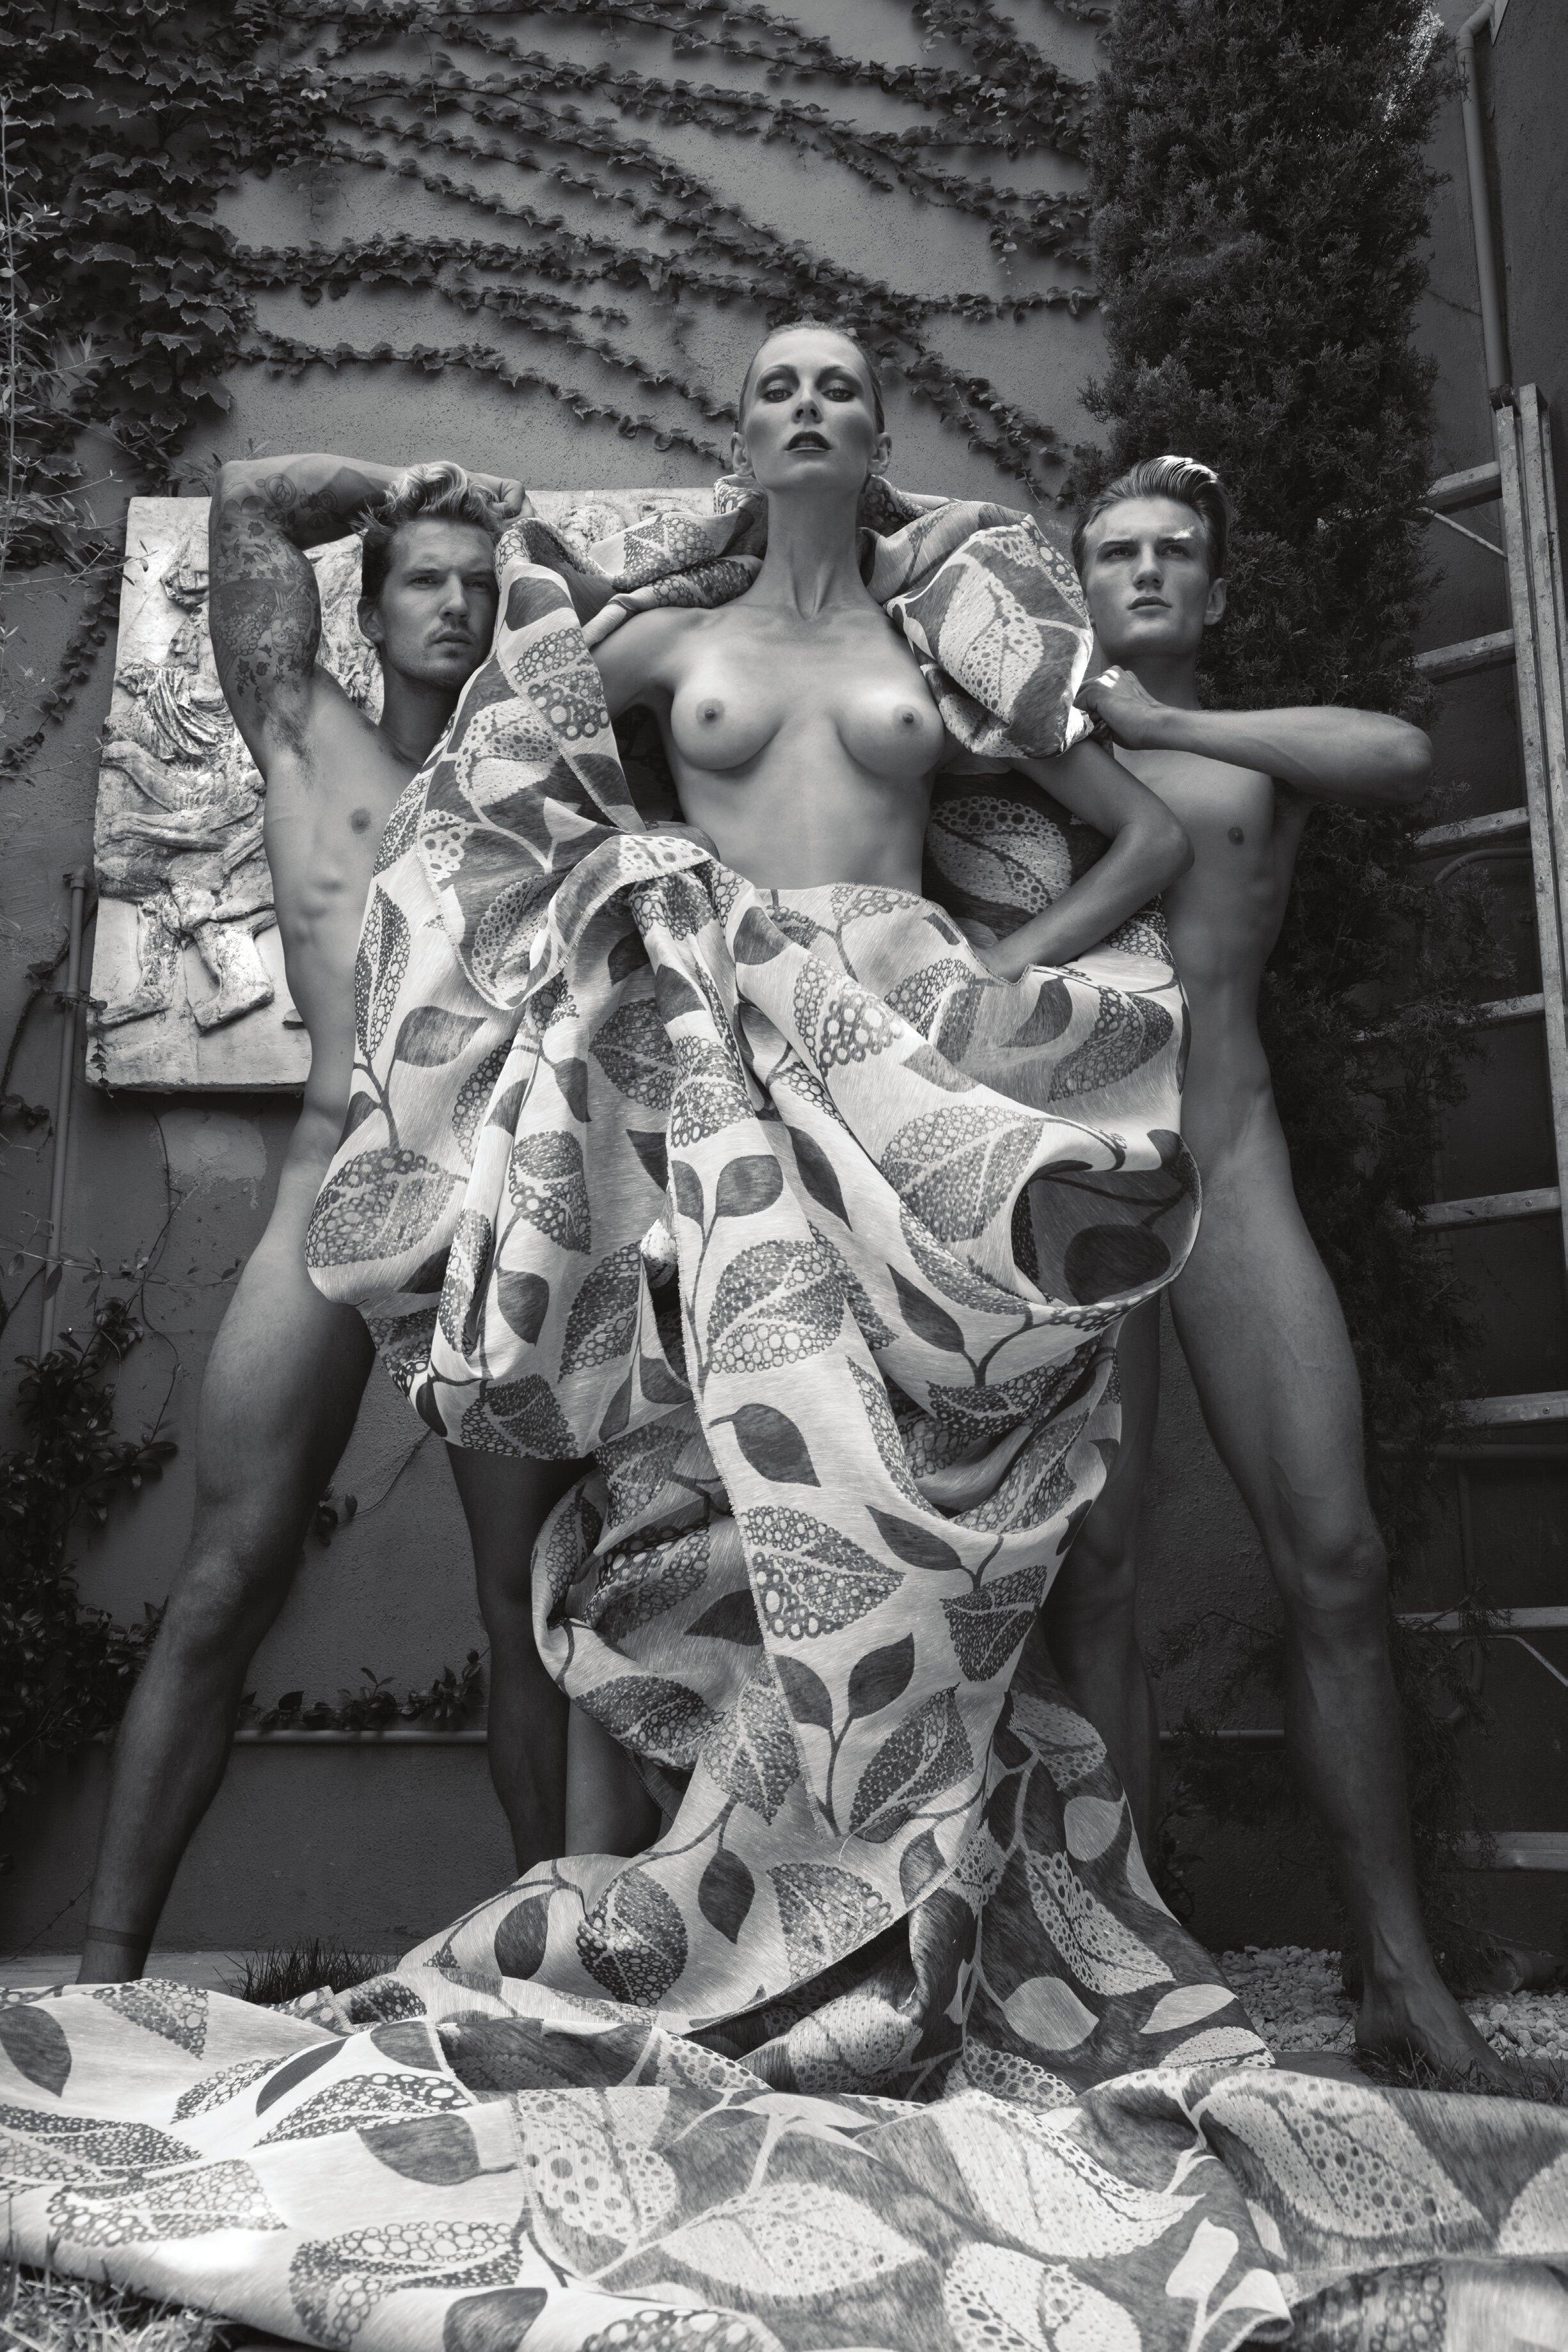 'Modern-Artisans'-Treats-Magazine-4-Tony-Duran-3.jpg